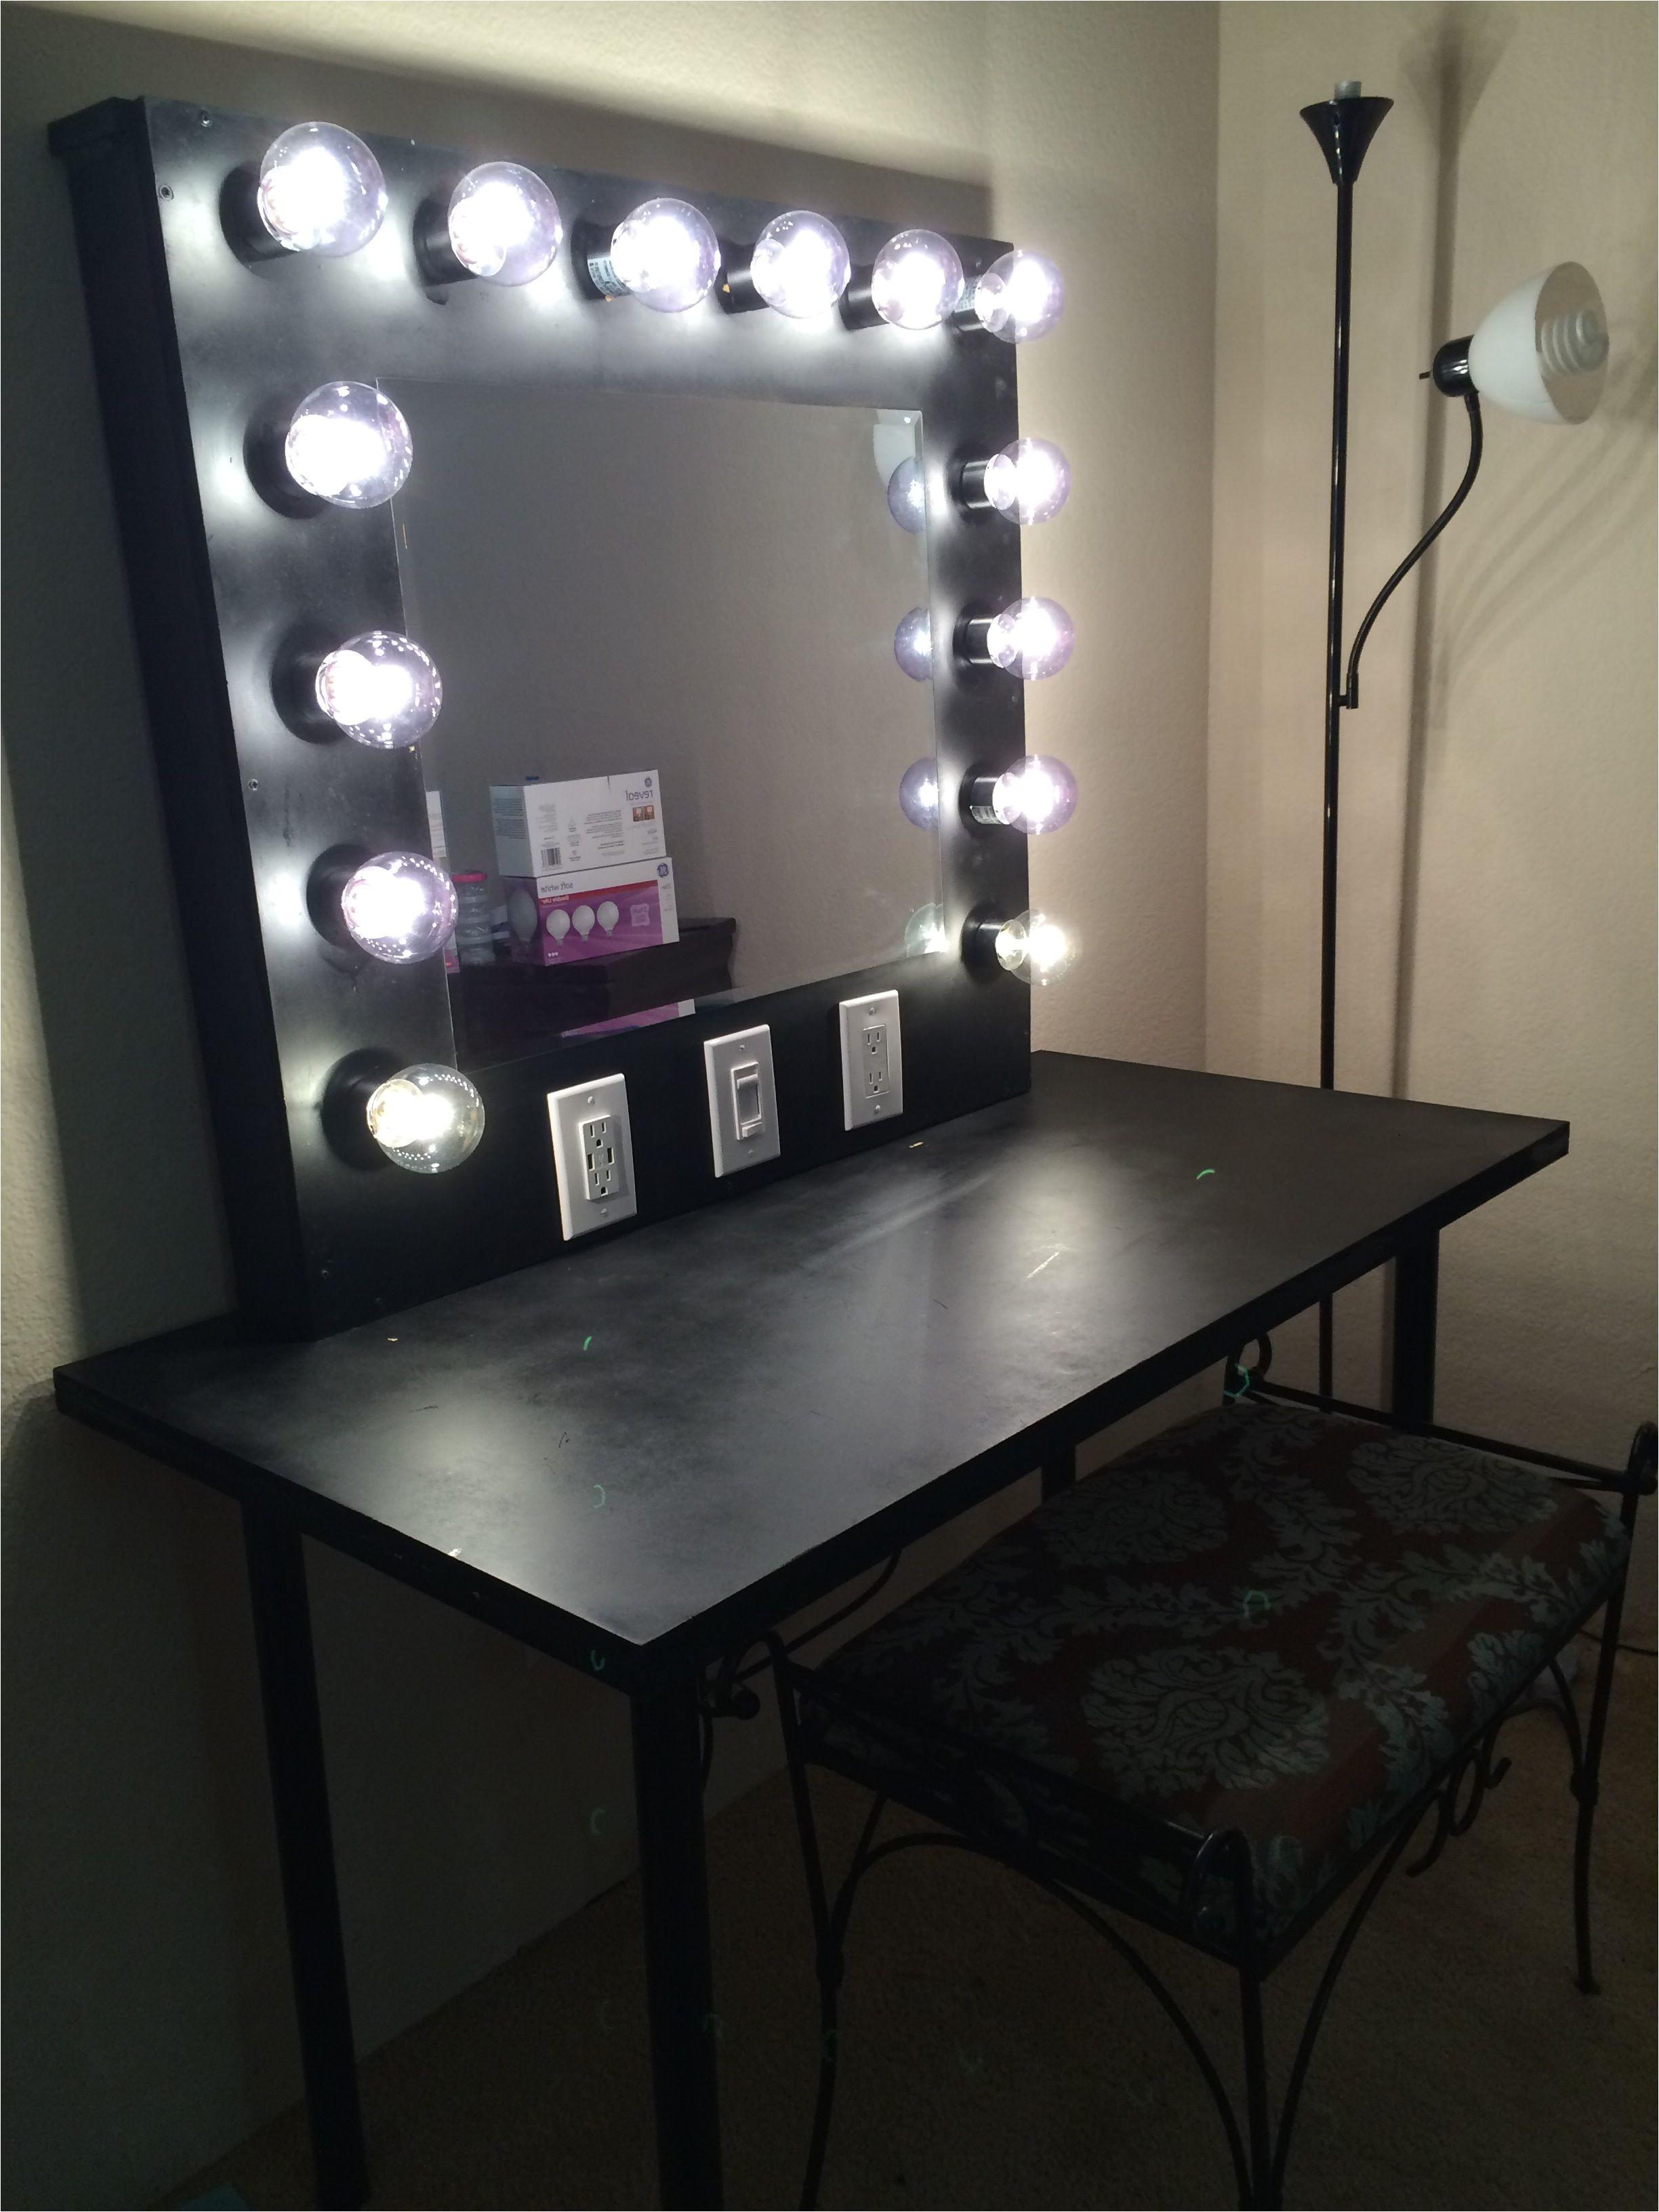 Makeup Mirror with Light Bulbs Ikea 17 Diy Vanity Mirror Ideas to Make Your Room More Beautiful Diy